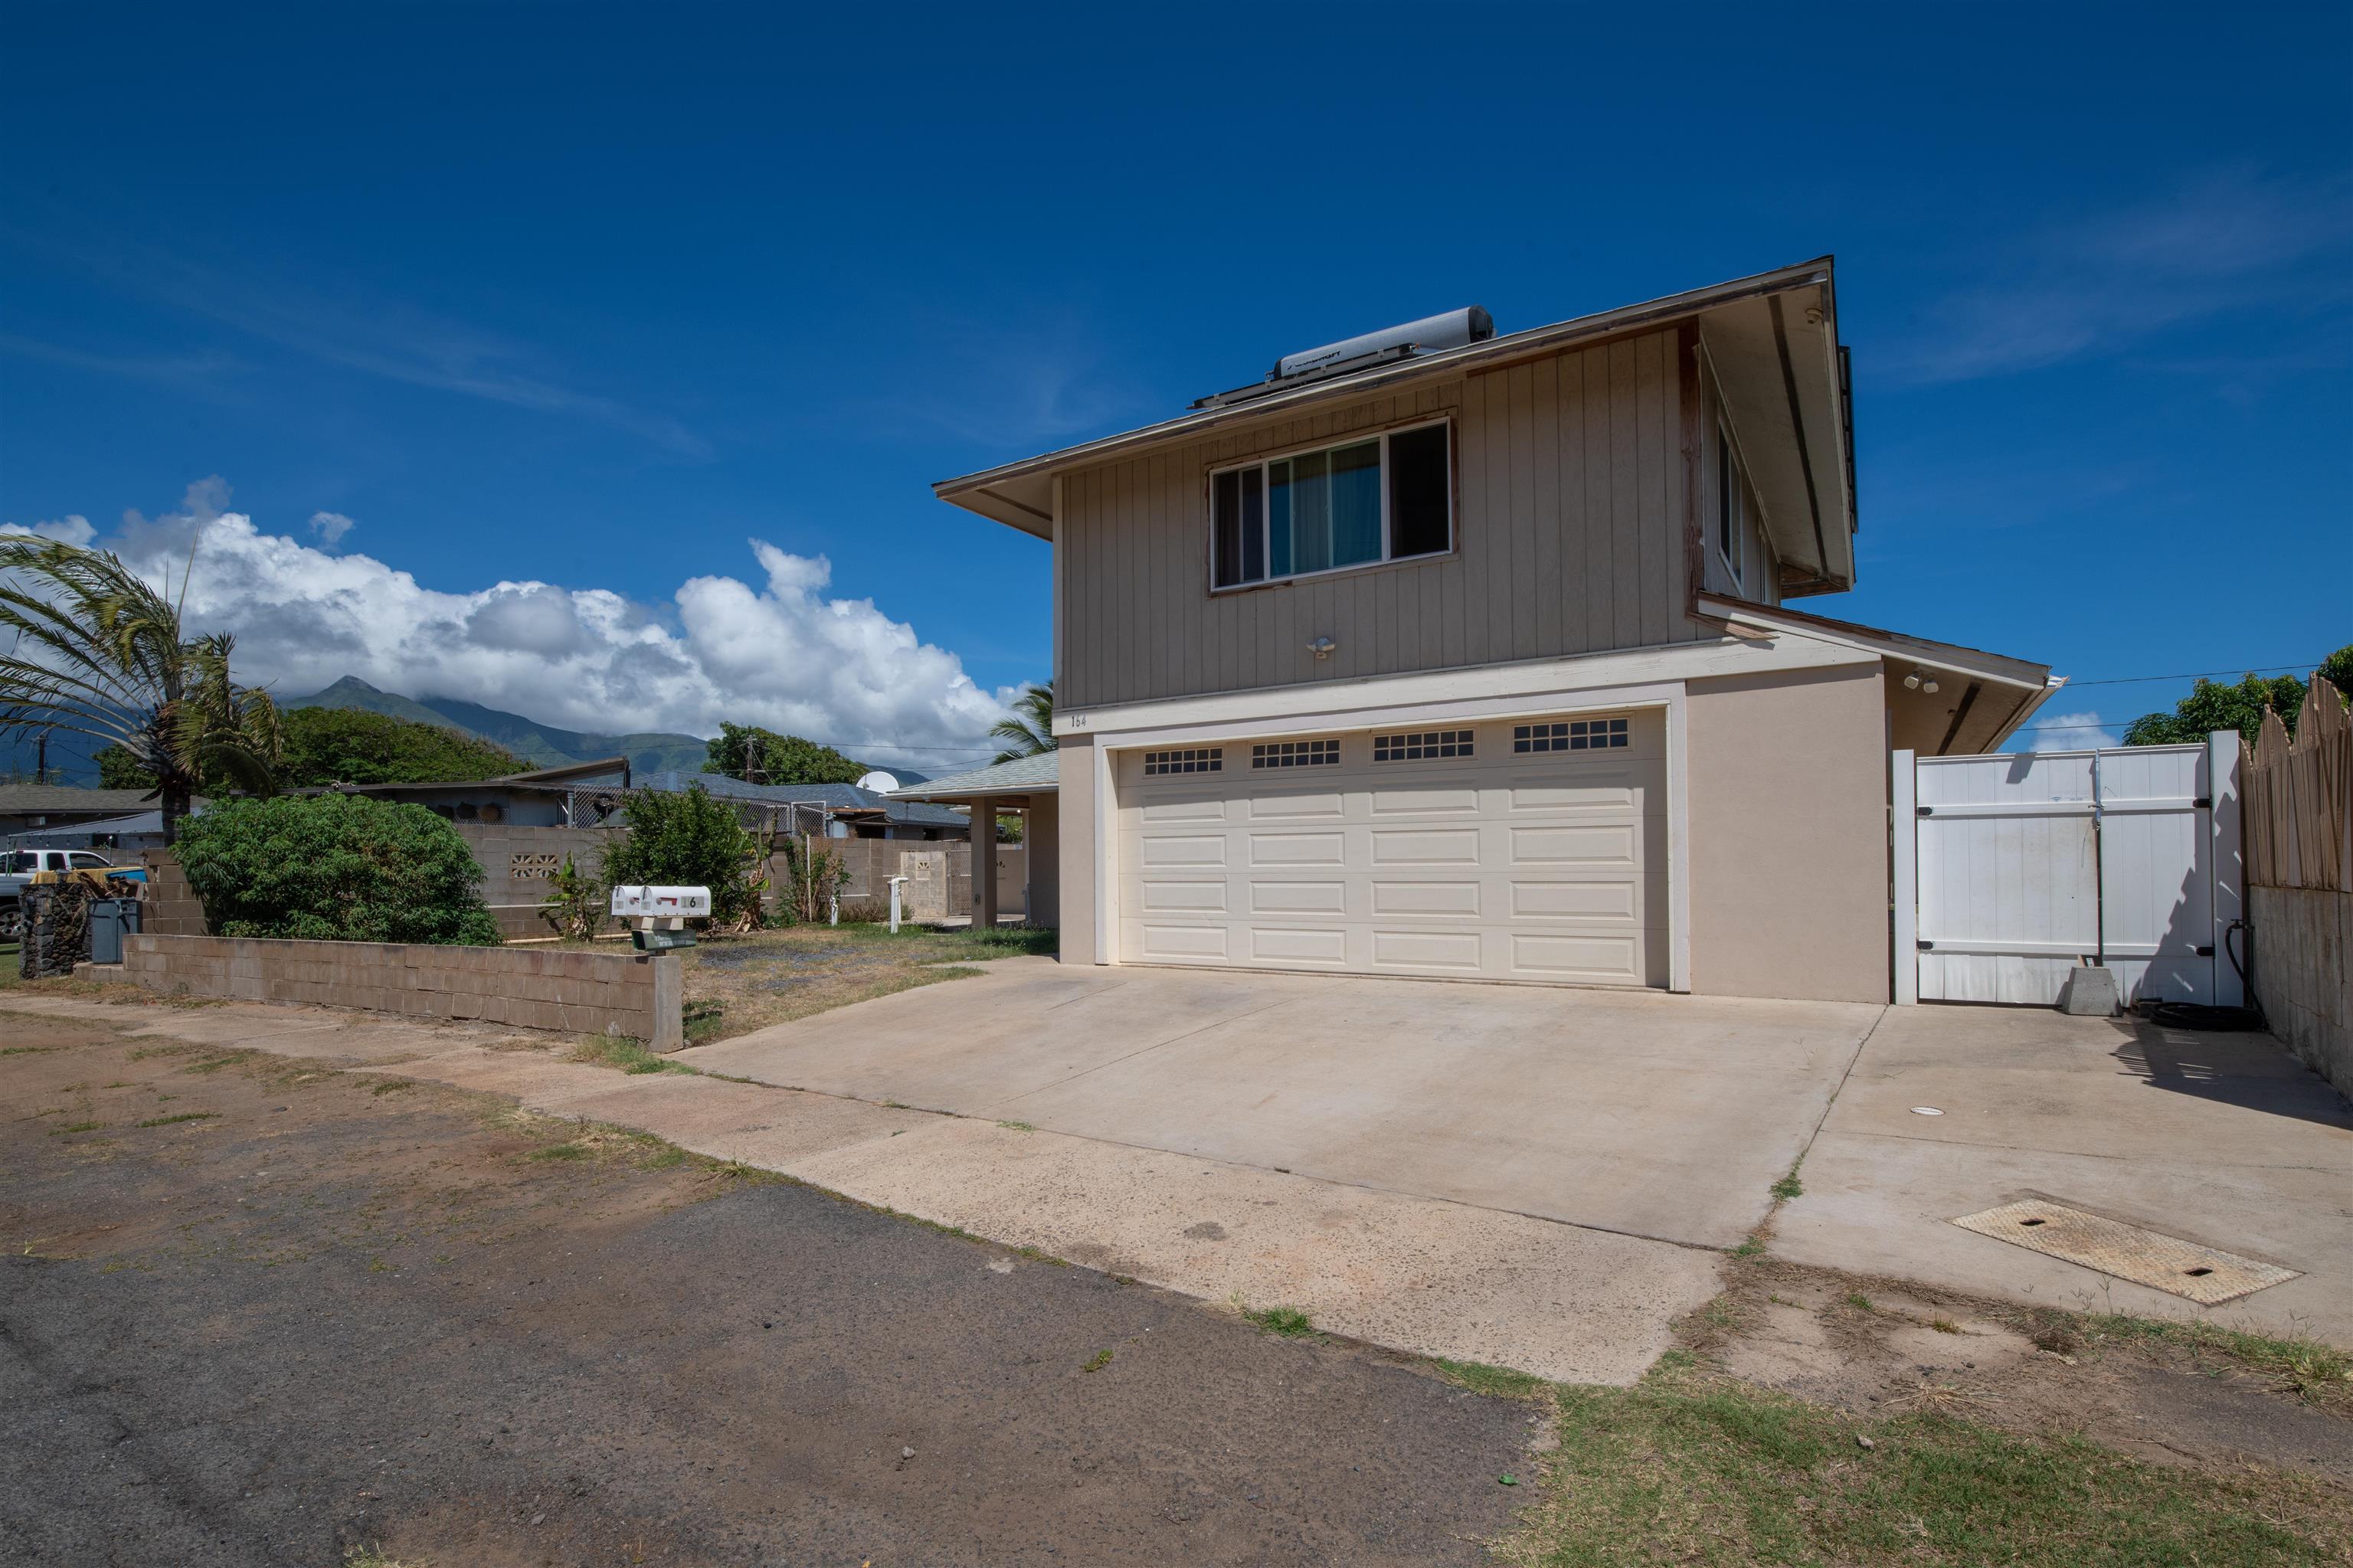 164 W Kauai St Property Photo